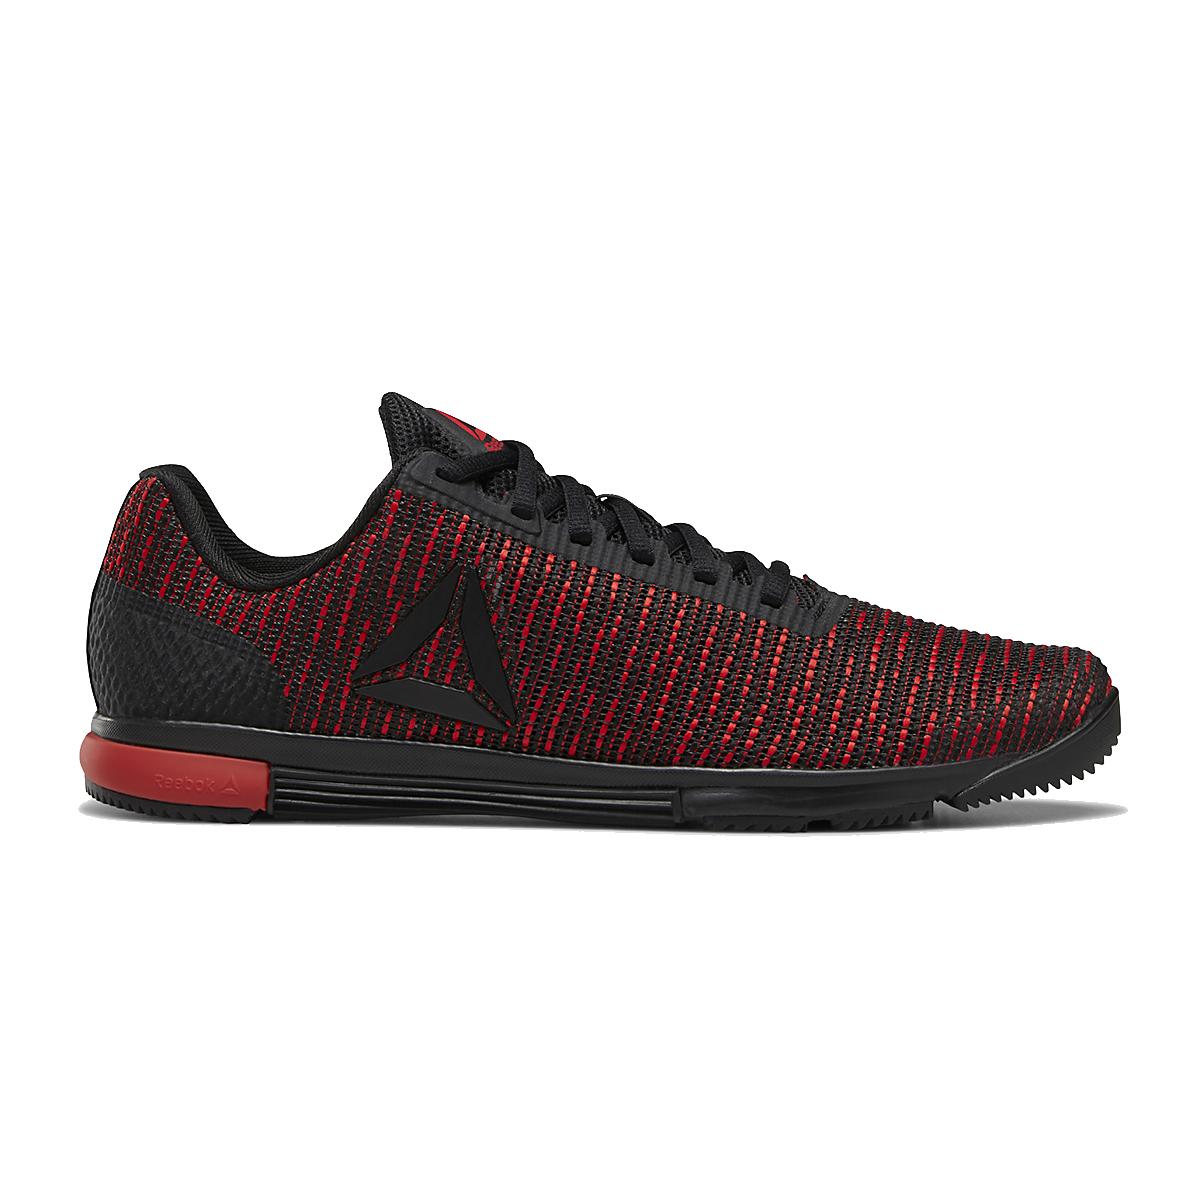 Men's Reebok Speed TR Flexweave Cross Training Shoes - Color: Black/Primal Red/Black - Size: 7 - Width: Regular, Black/Primal Red/Black, large, image 1